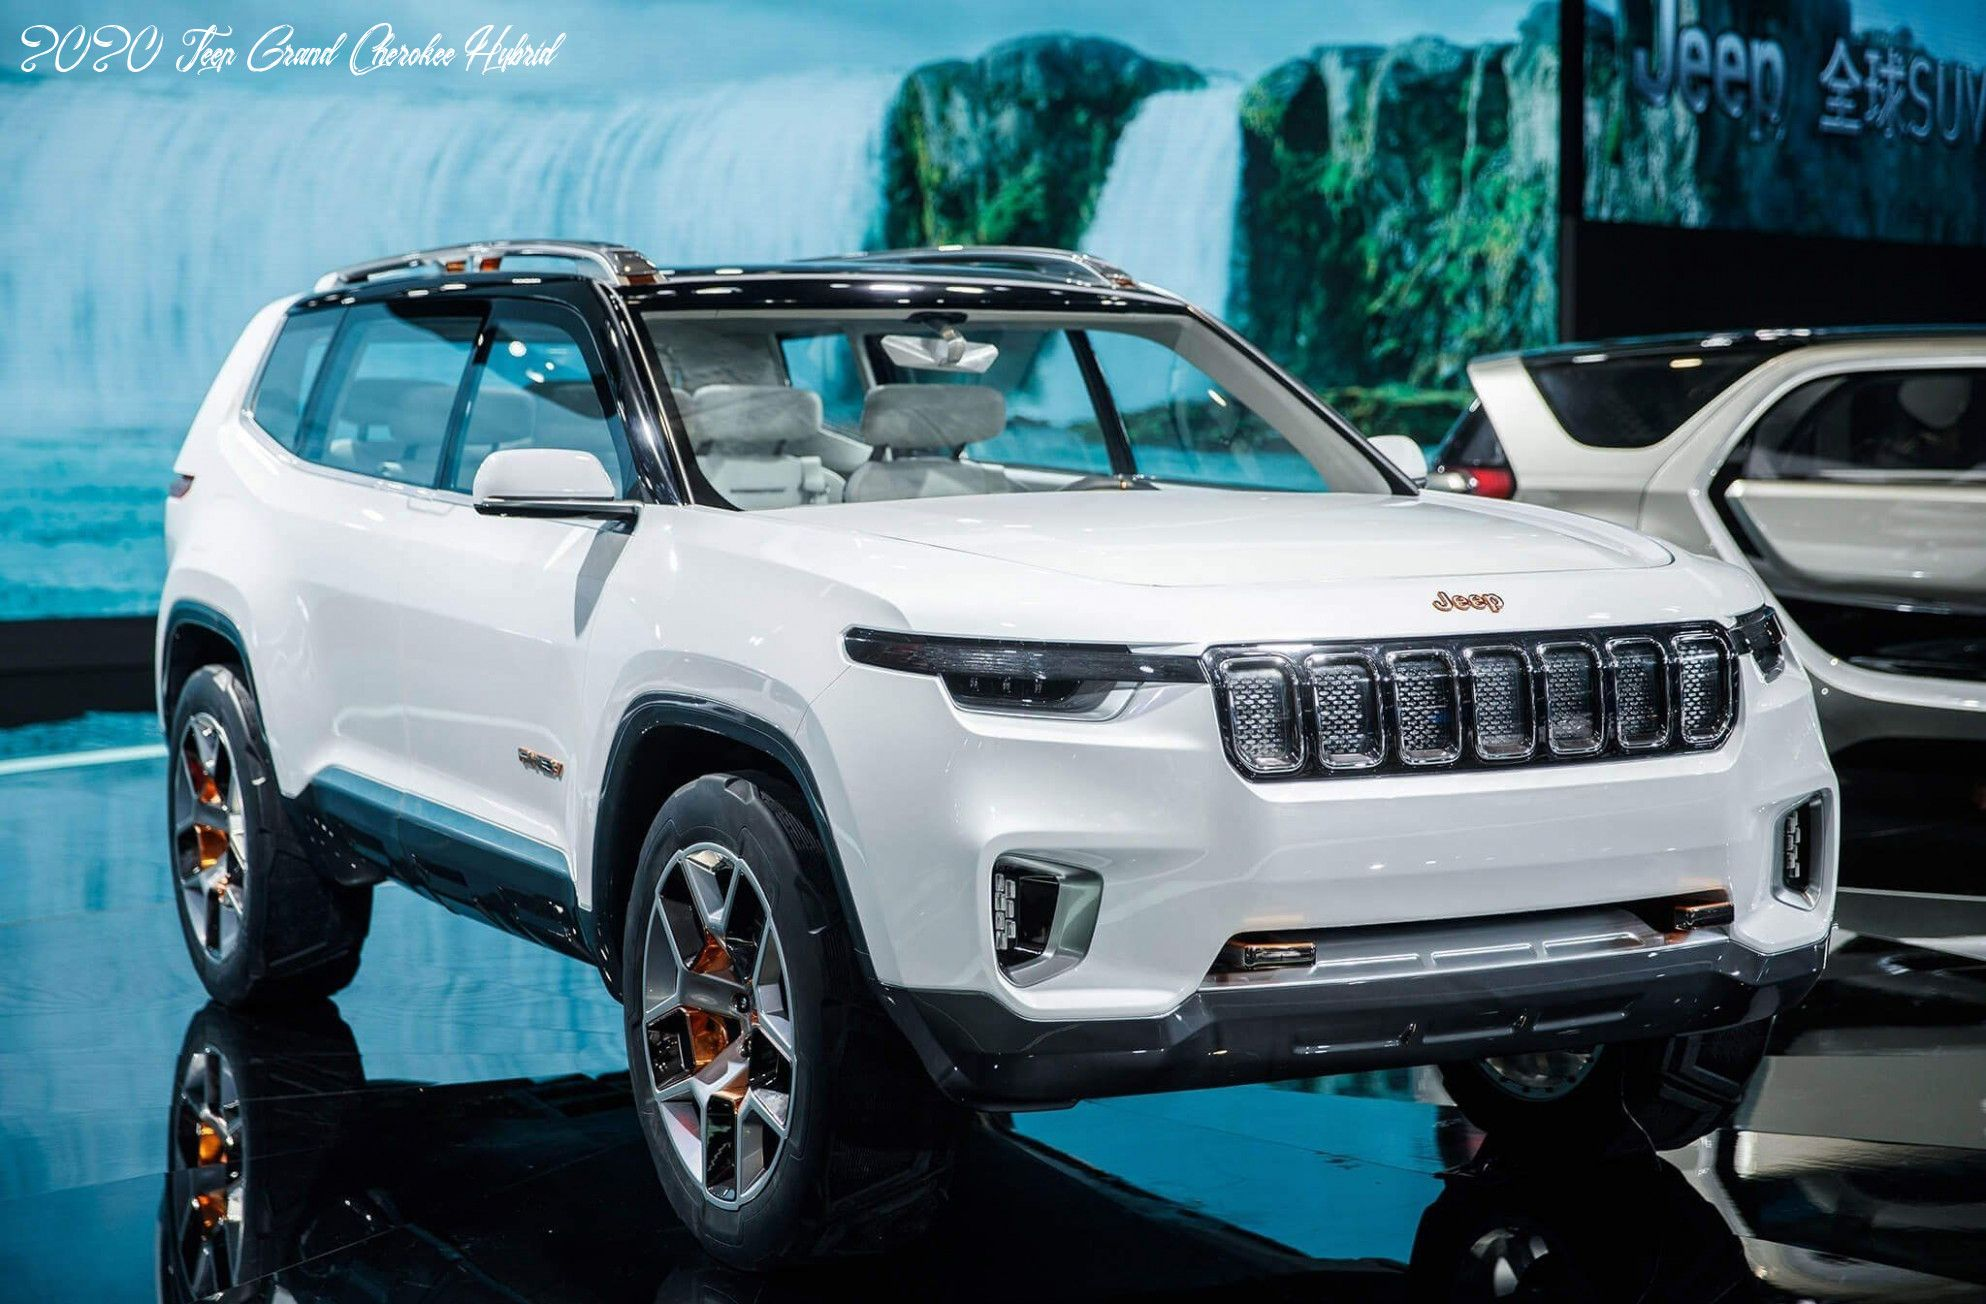 2020 Jeep Grand Cherokee Hybrid Photos In 2020 Jeep Concept Jeep Grand Jeep Grand Cherokee